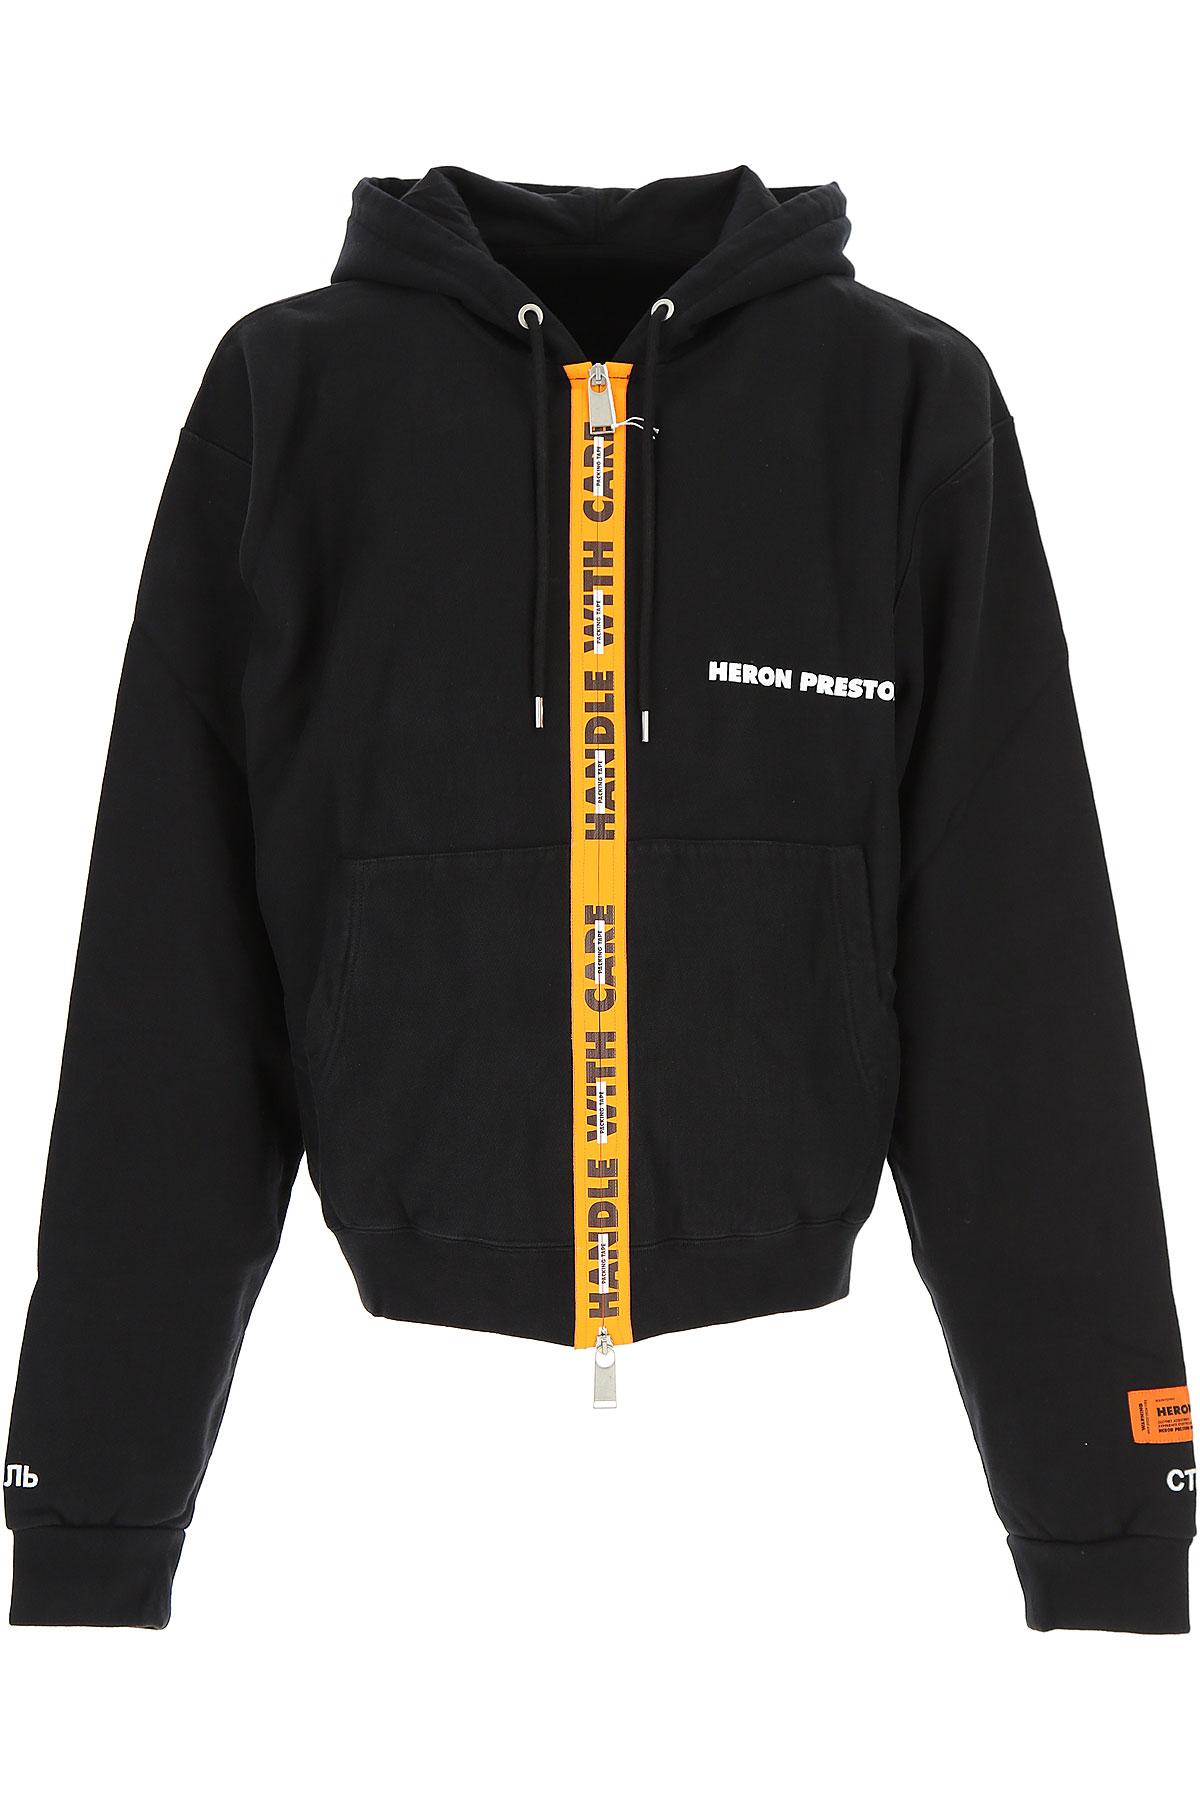 Image of Heron Preston Sweatshirt for Men, Black, Cotton, 2017, L M S